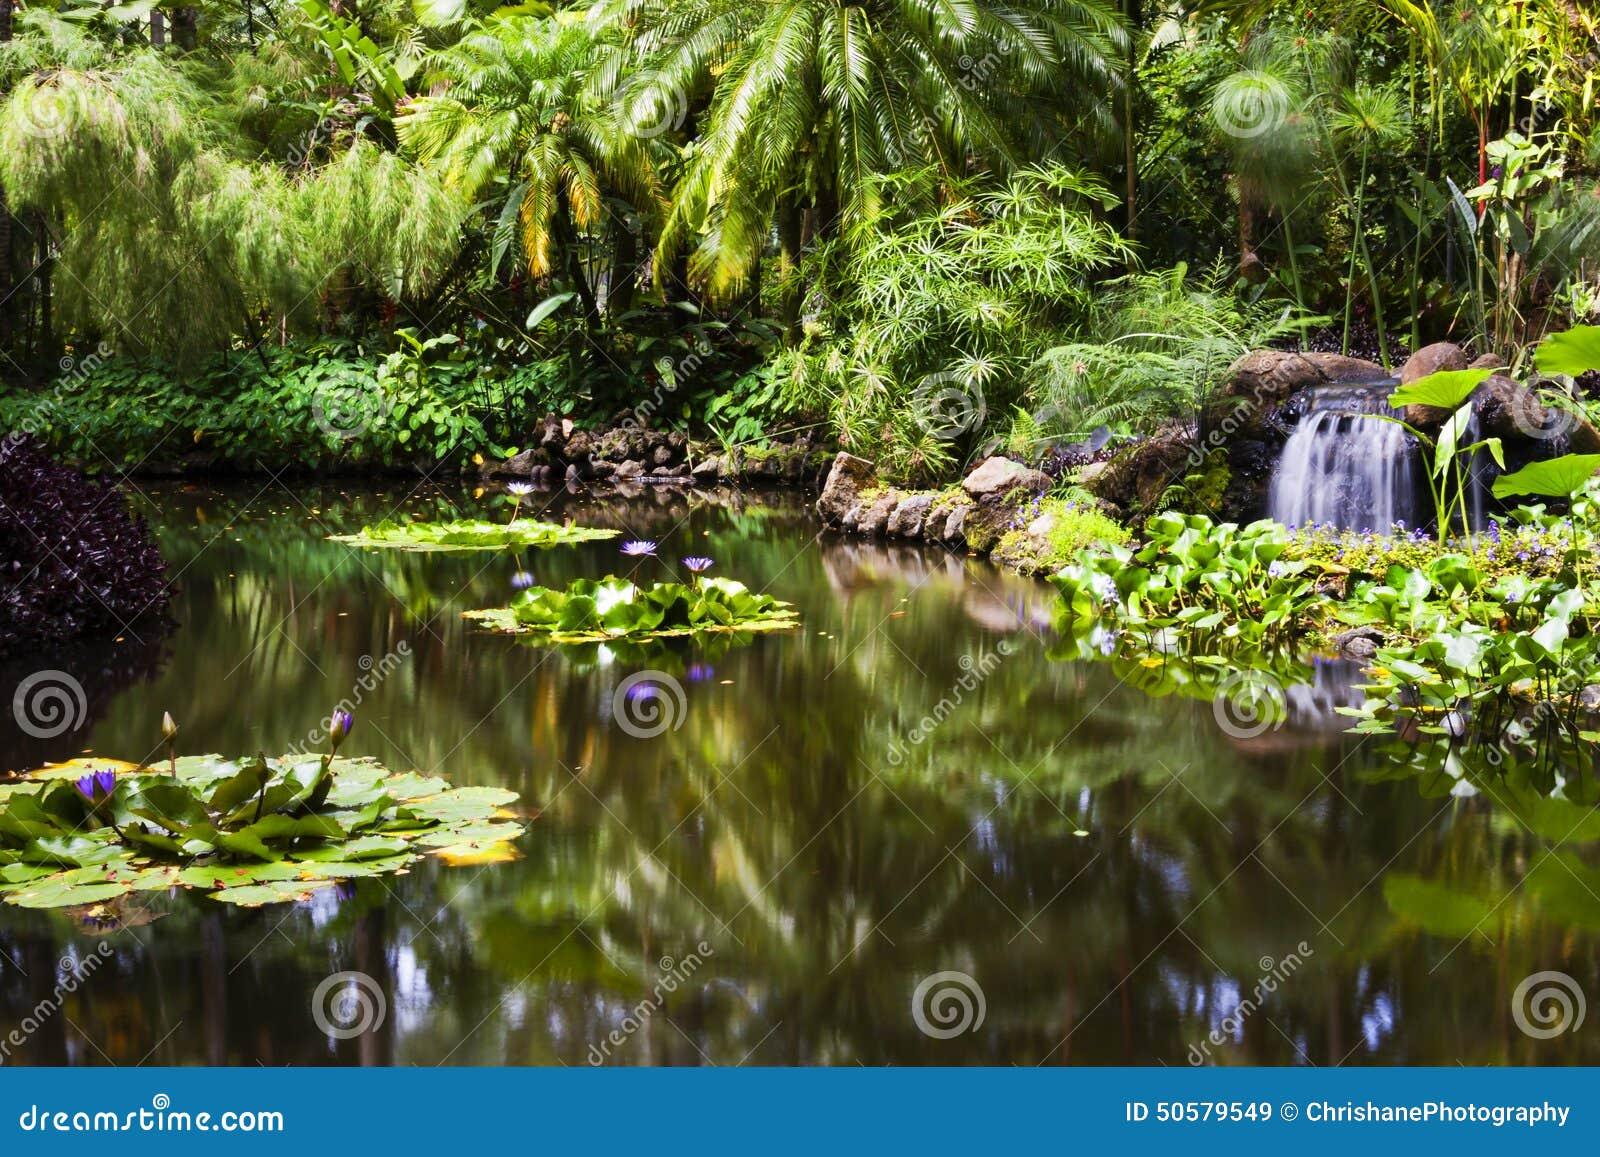 Gold Fish Pond At The Hawaii Tropical Botanical Garden Stock Photo Image 50579549